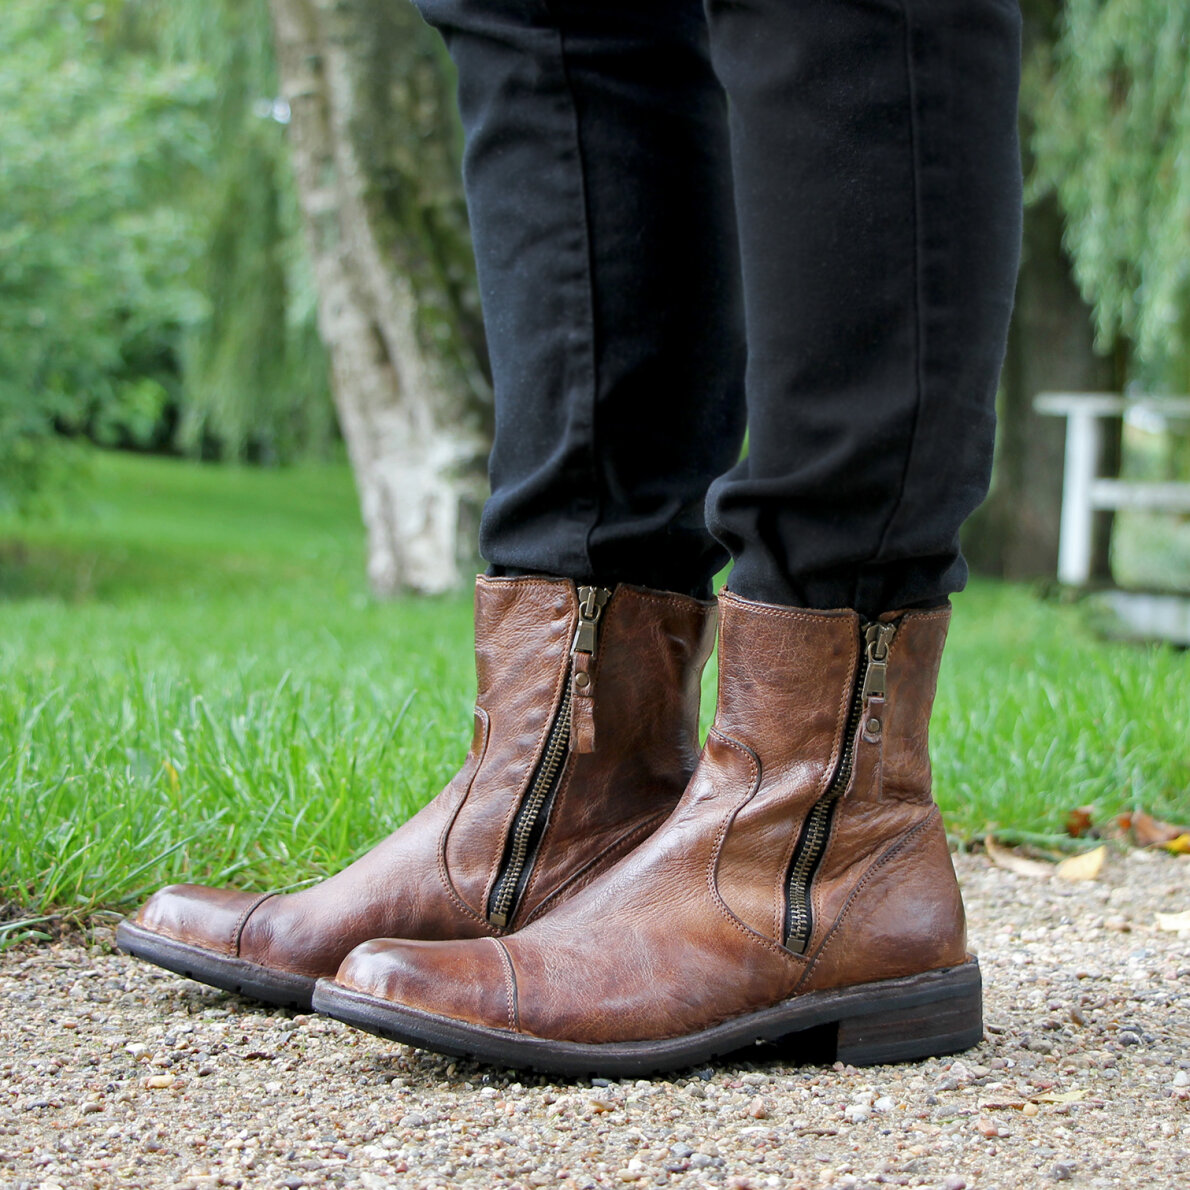 78884c90f91 ... Bubetti - Bubetti 6682 lys brun damestøvle i skind